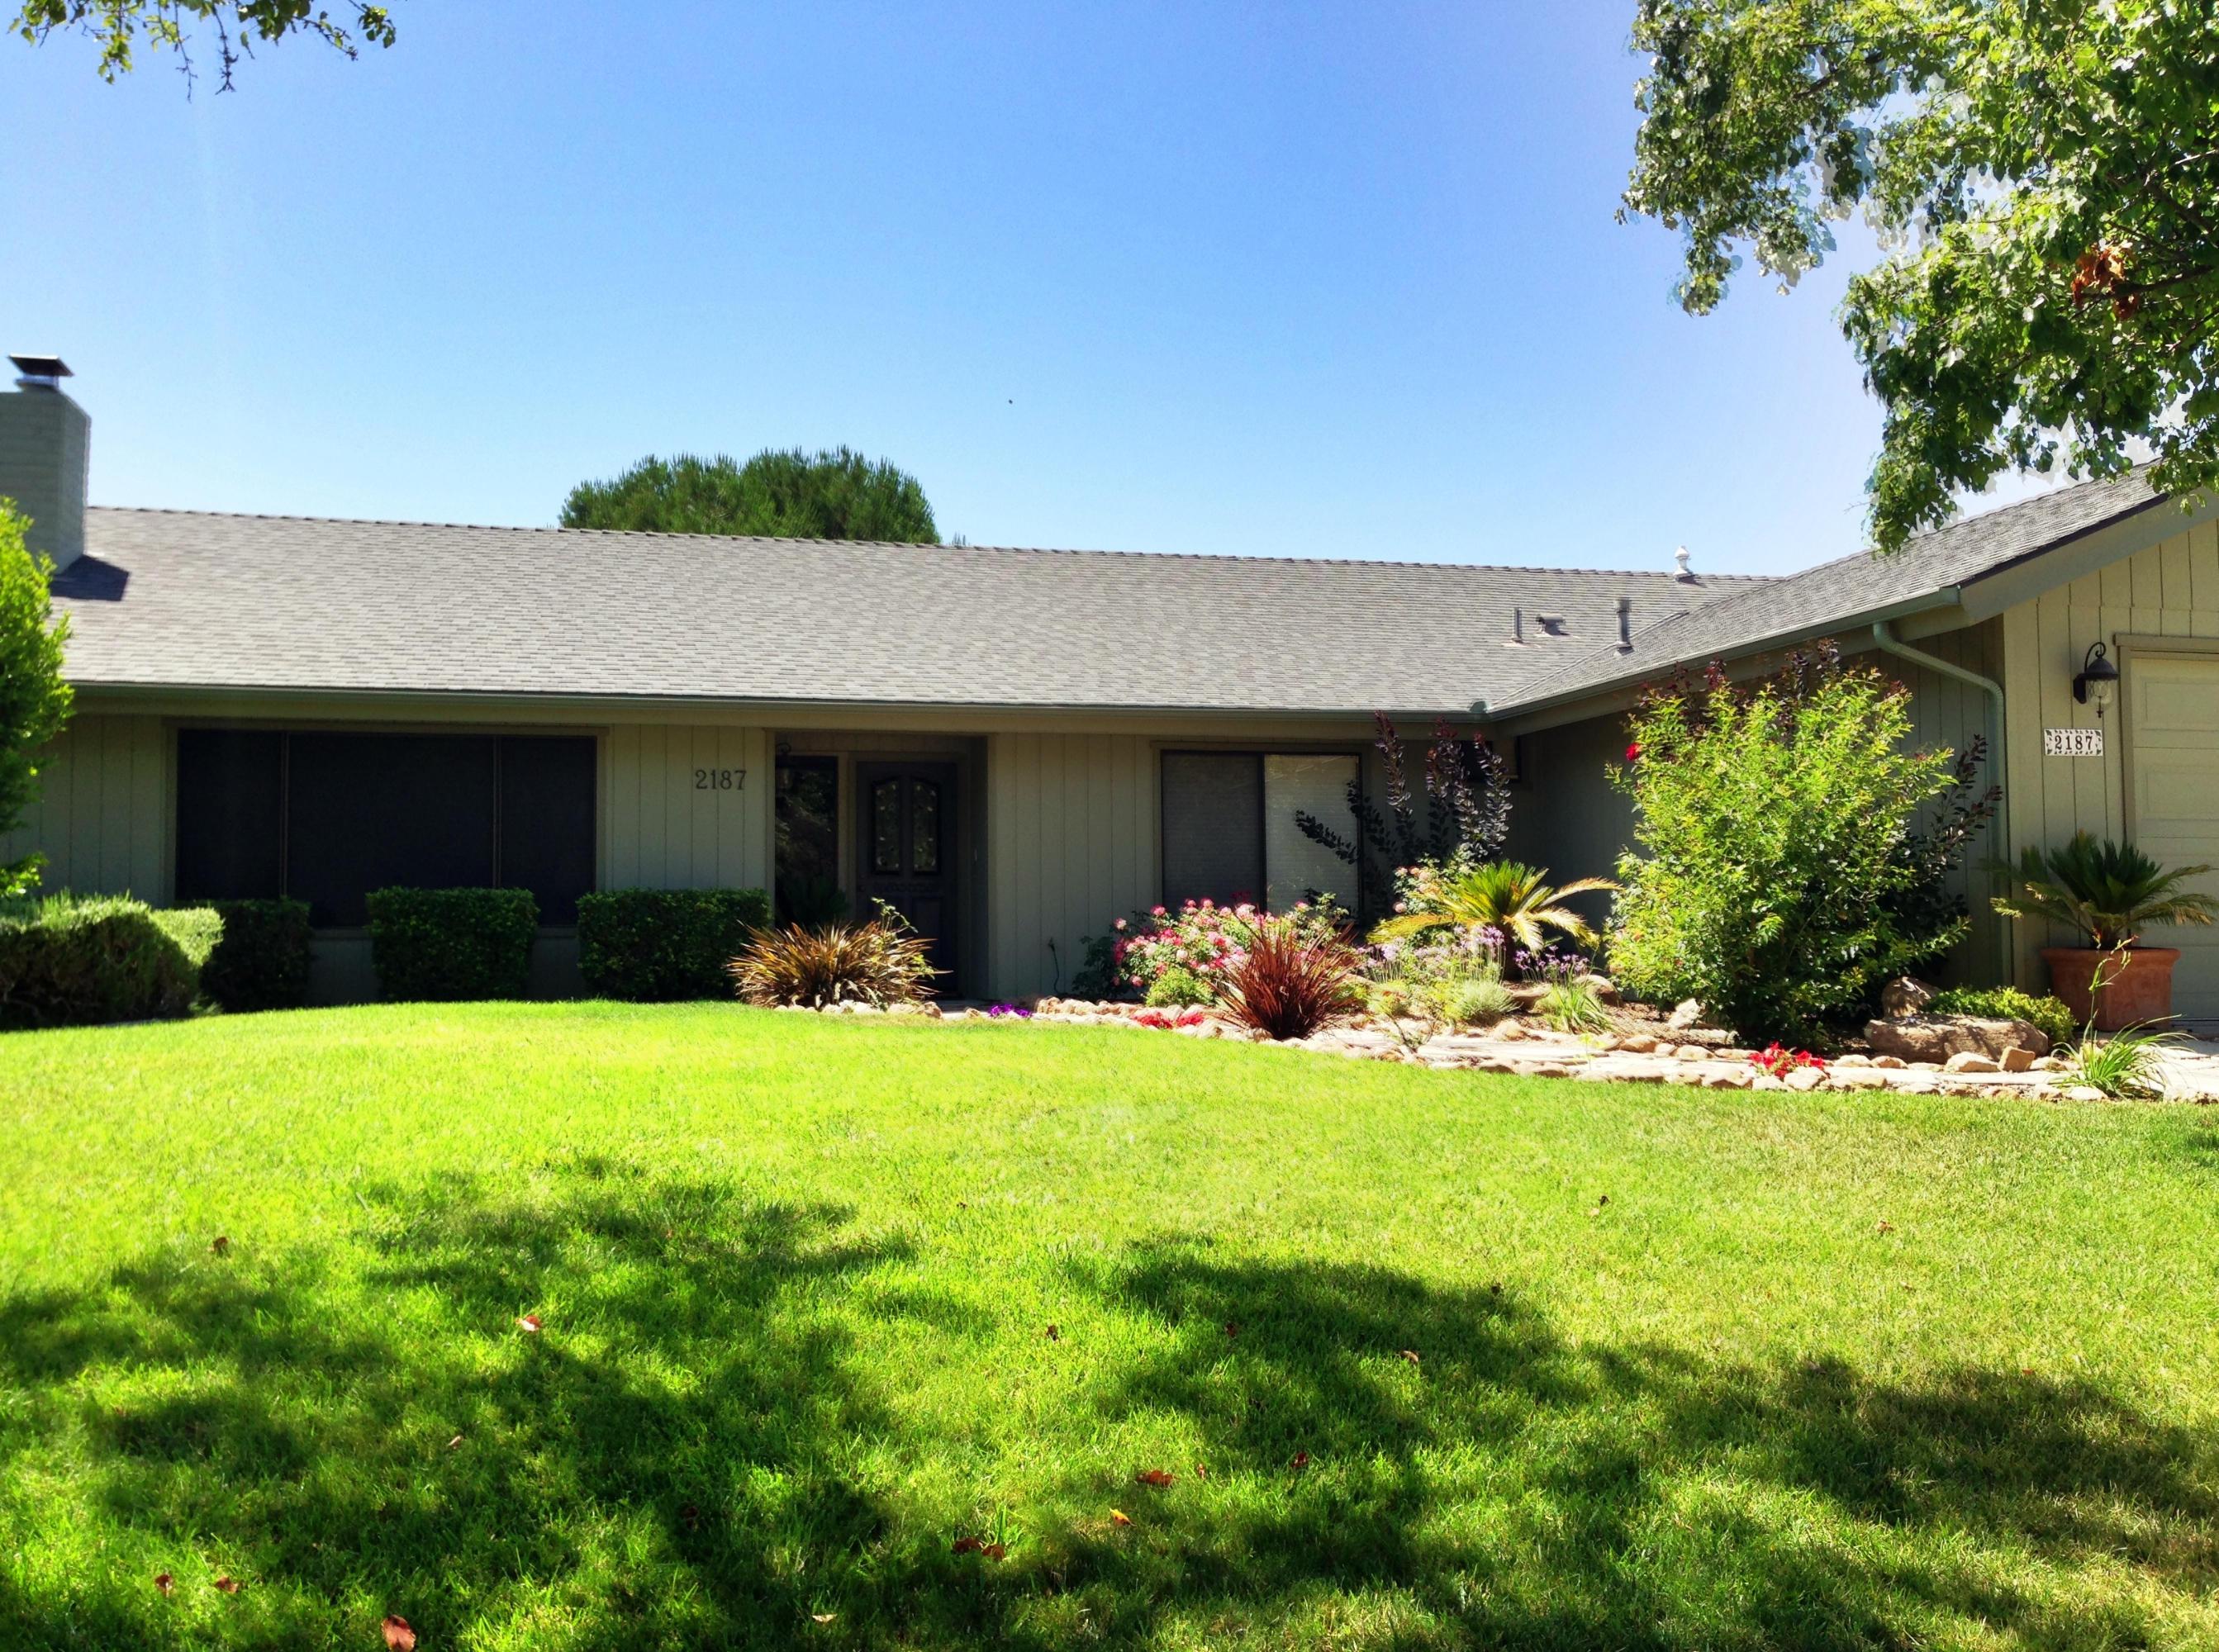 Property photo for 2187 Rebild Dr Solvang, California 93463 - 13-2272